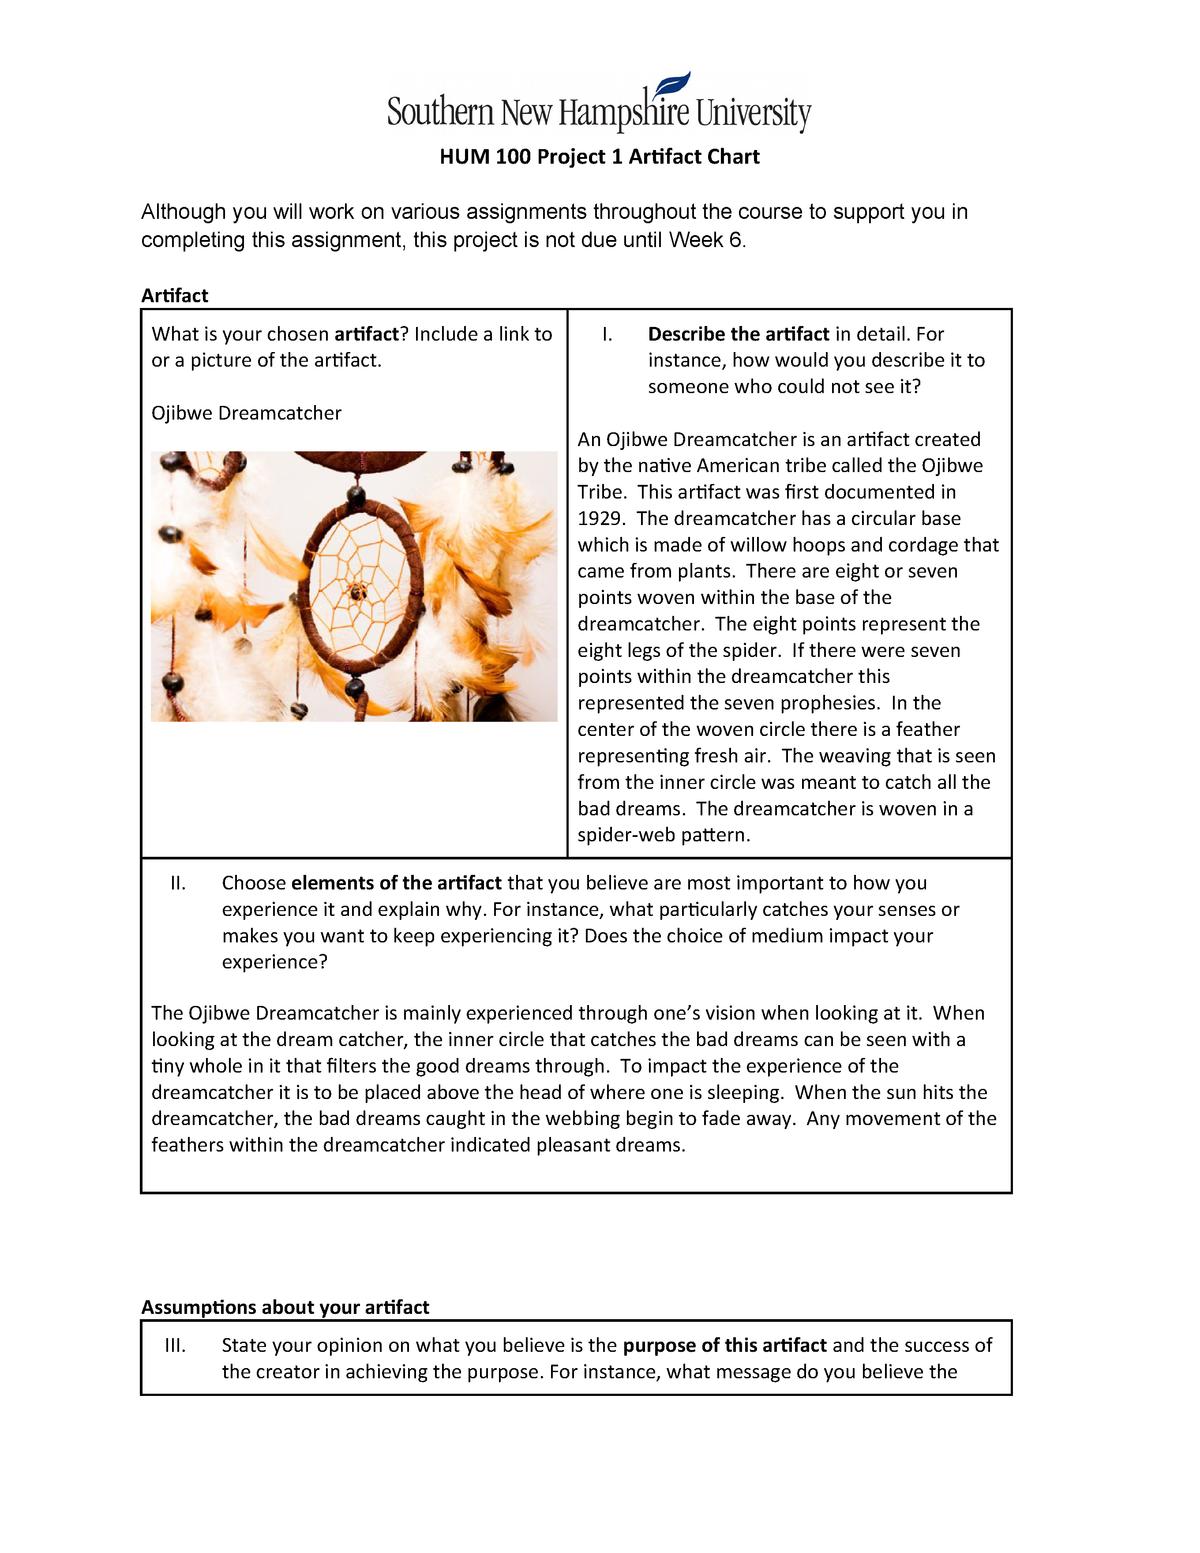 Hum100 project 1 artifact chart (1) Final draft - SNHU - StuDocu